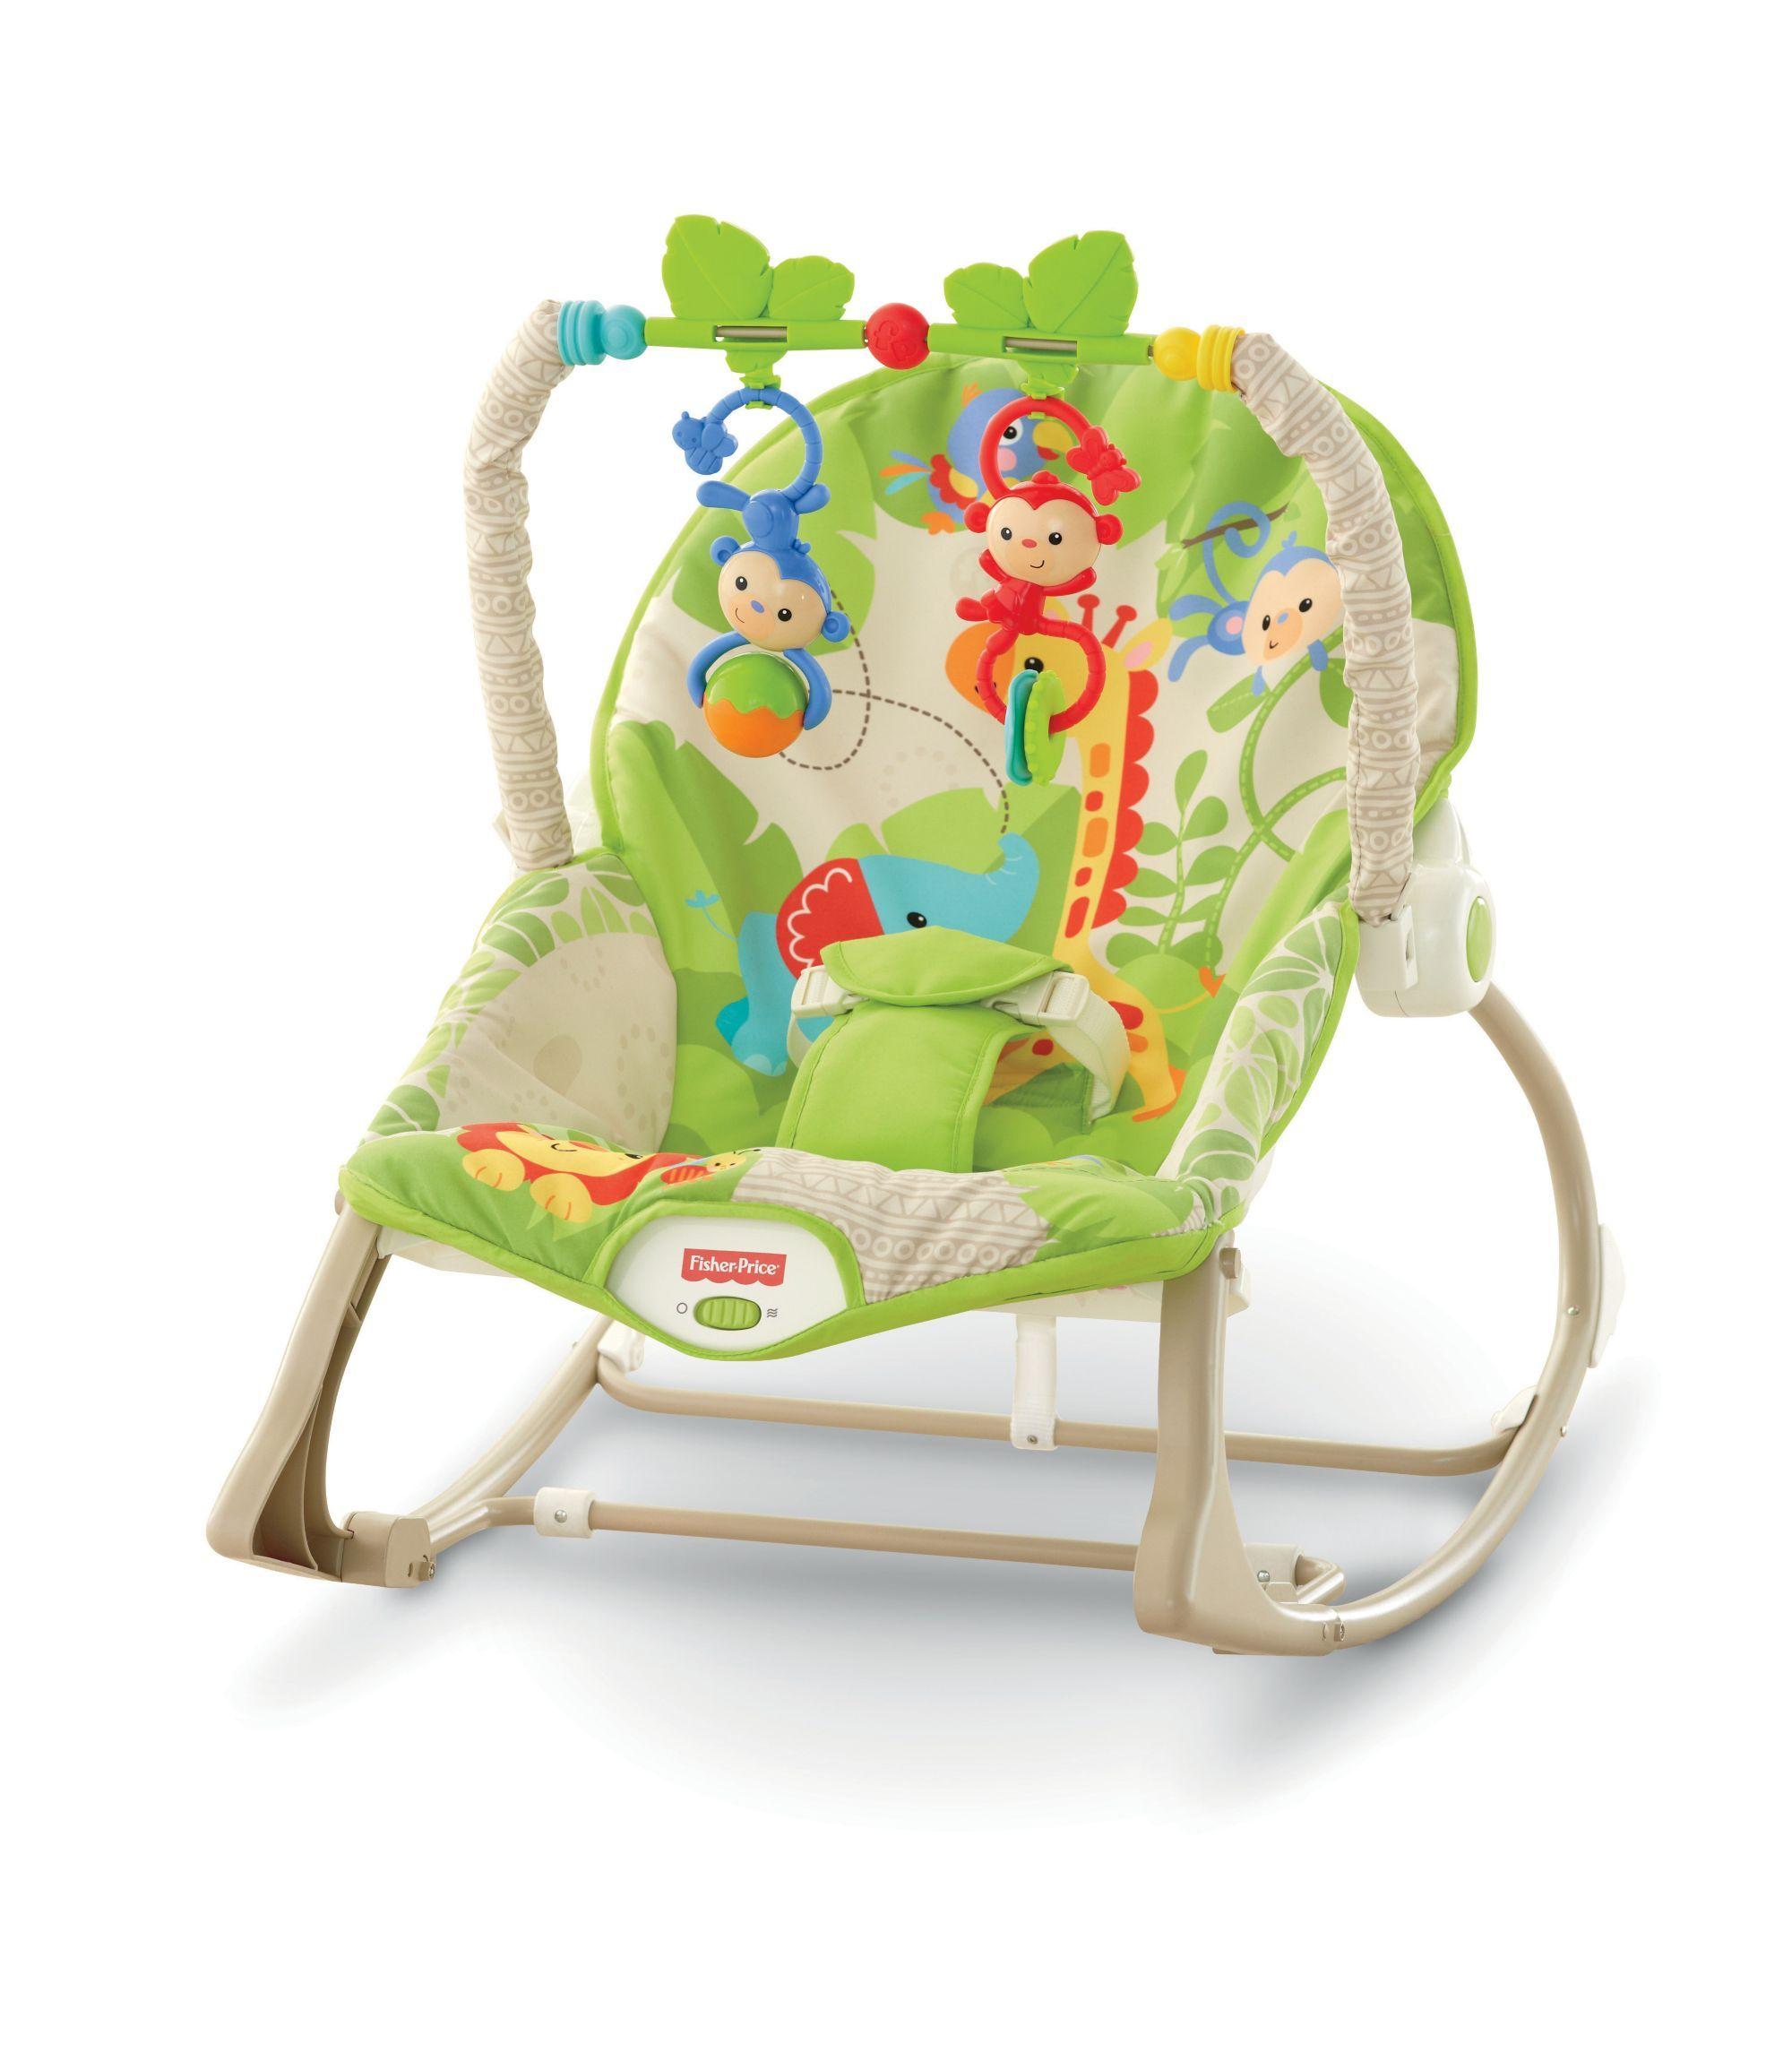 Fisher Price Rainforest Infant to Toddler Rocker